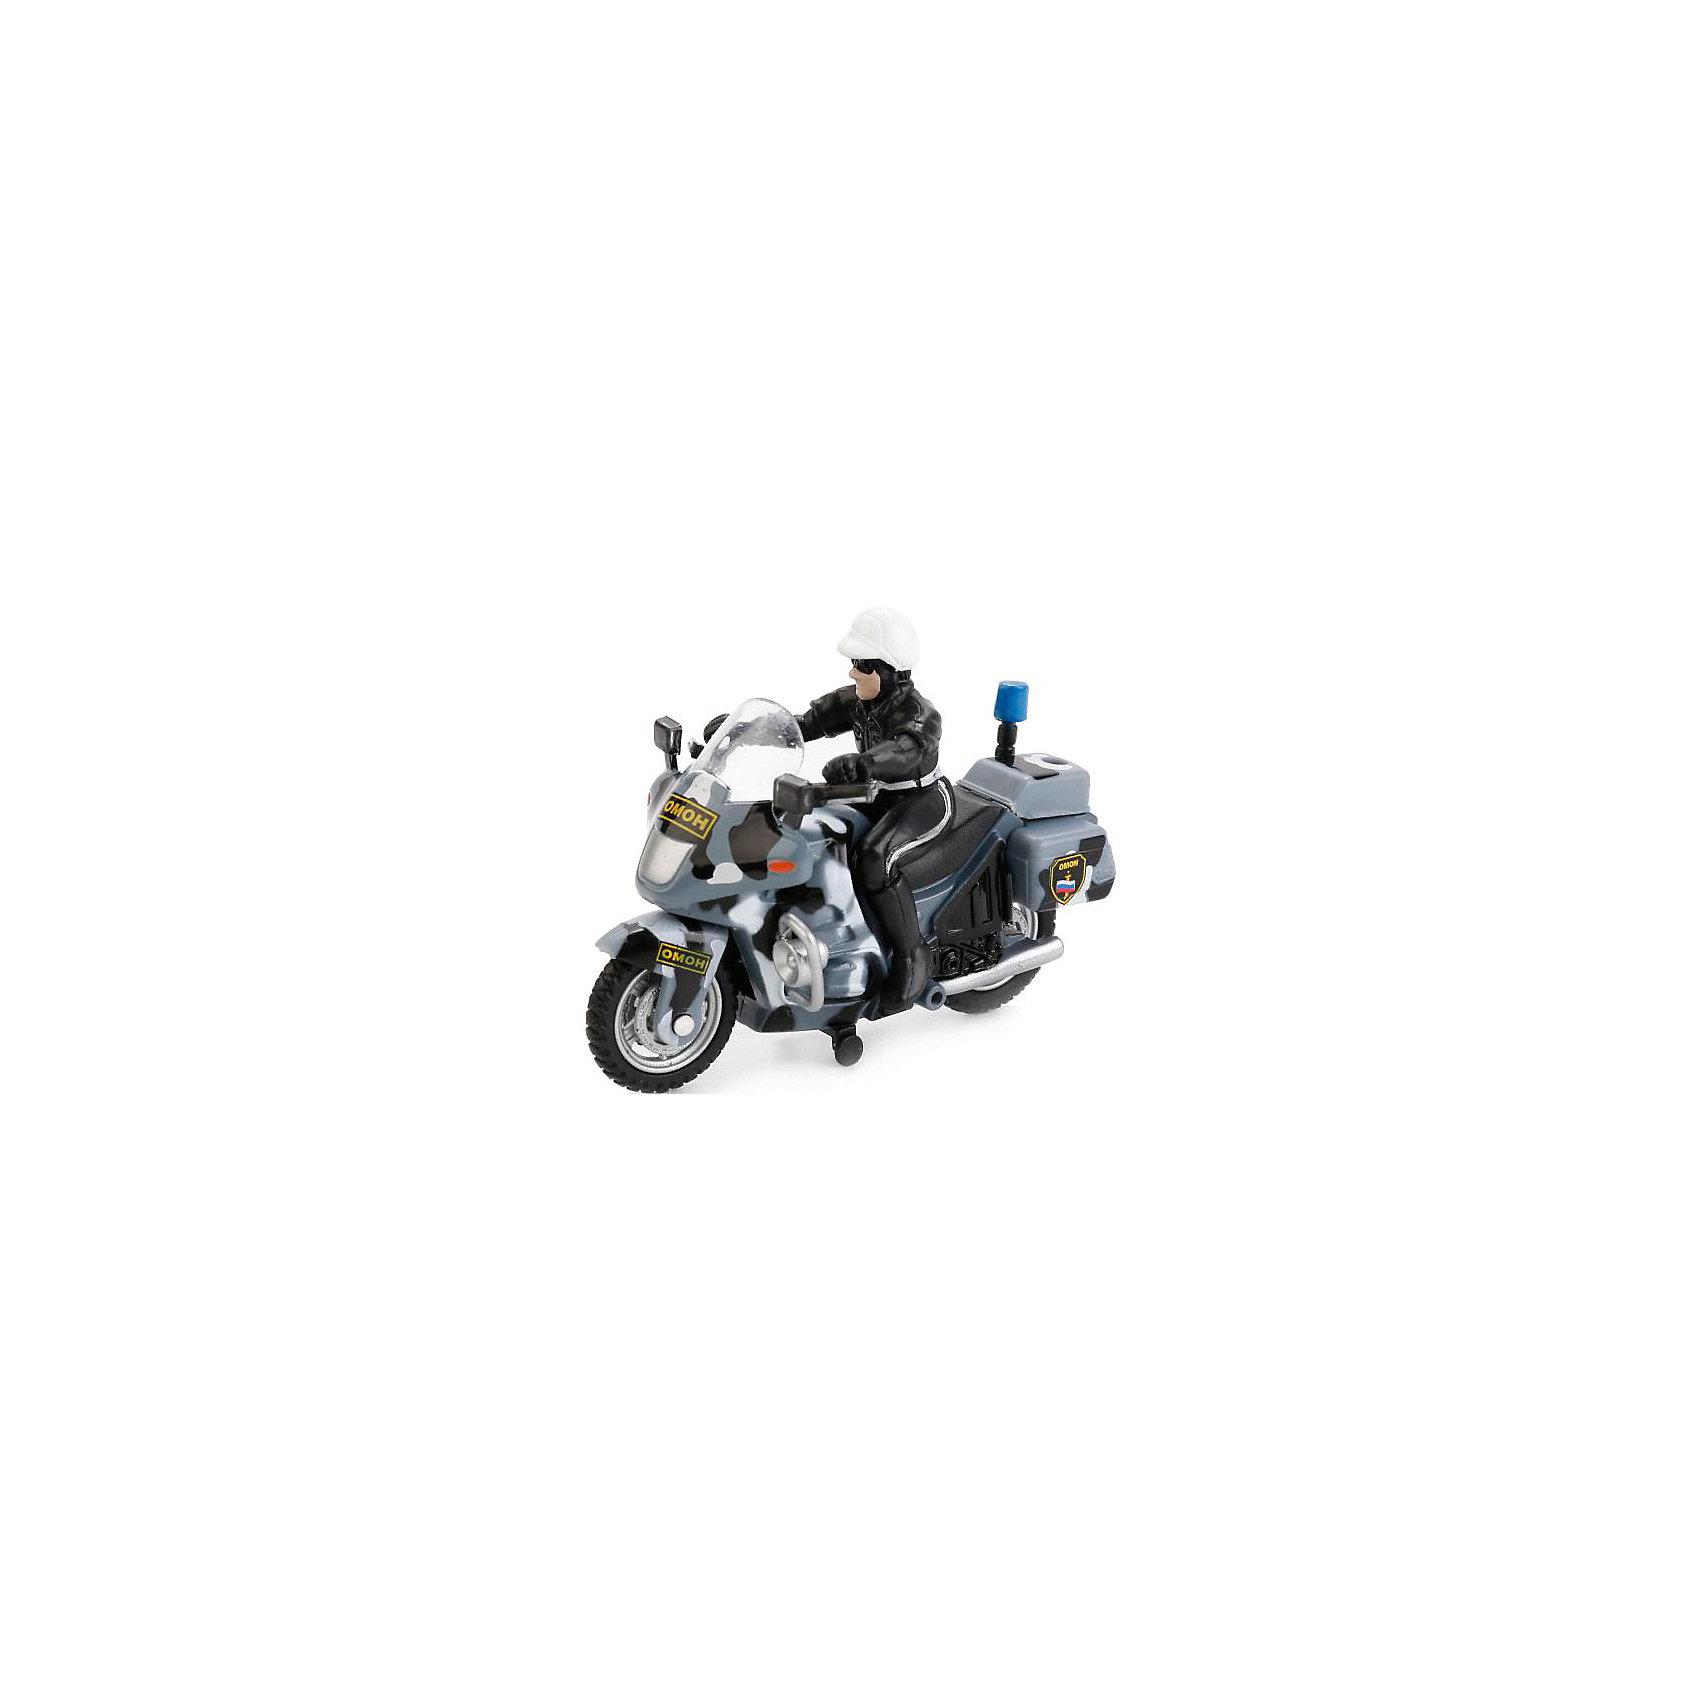 ТЕХНОПАРК Мотоцикл